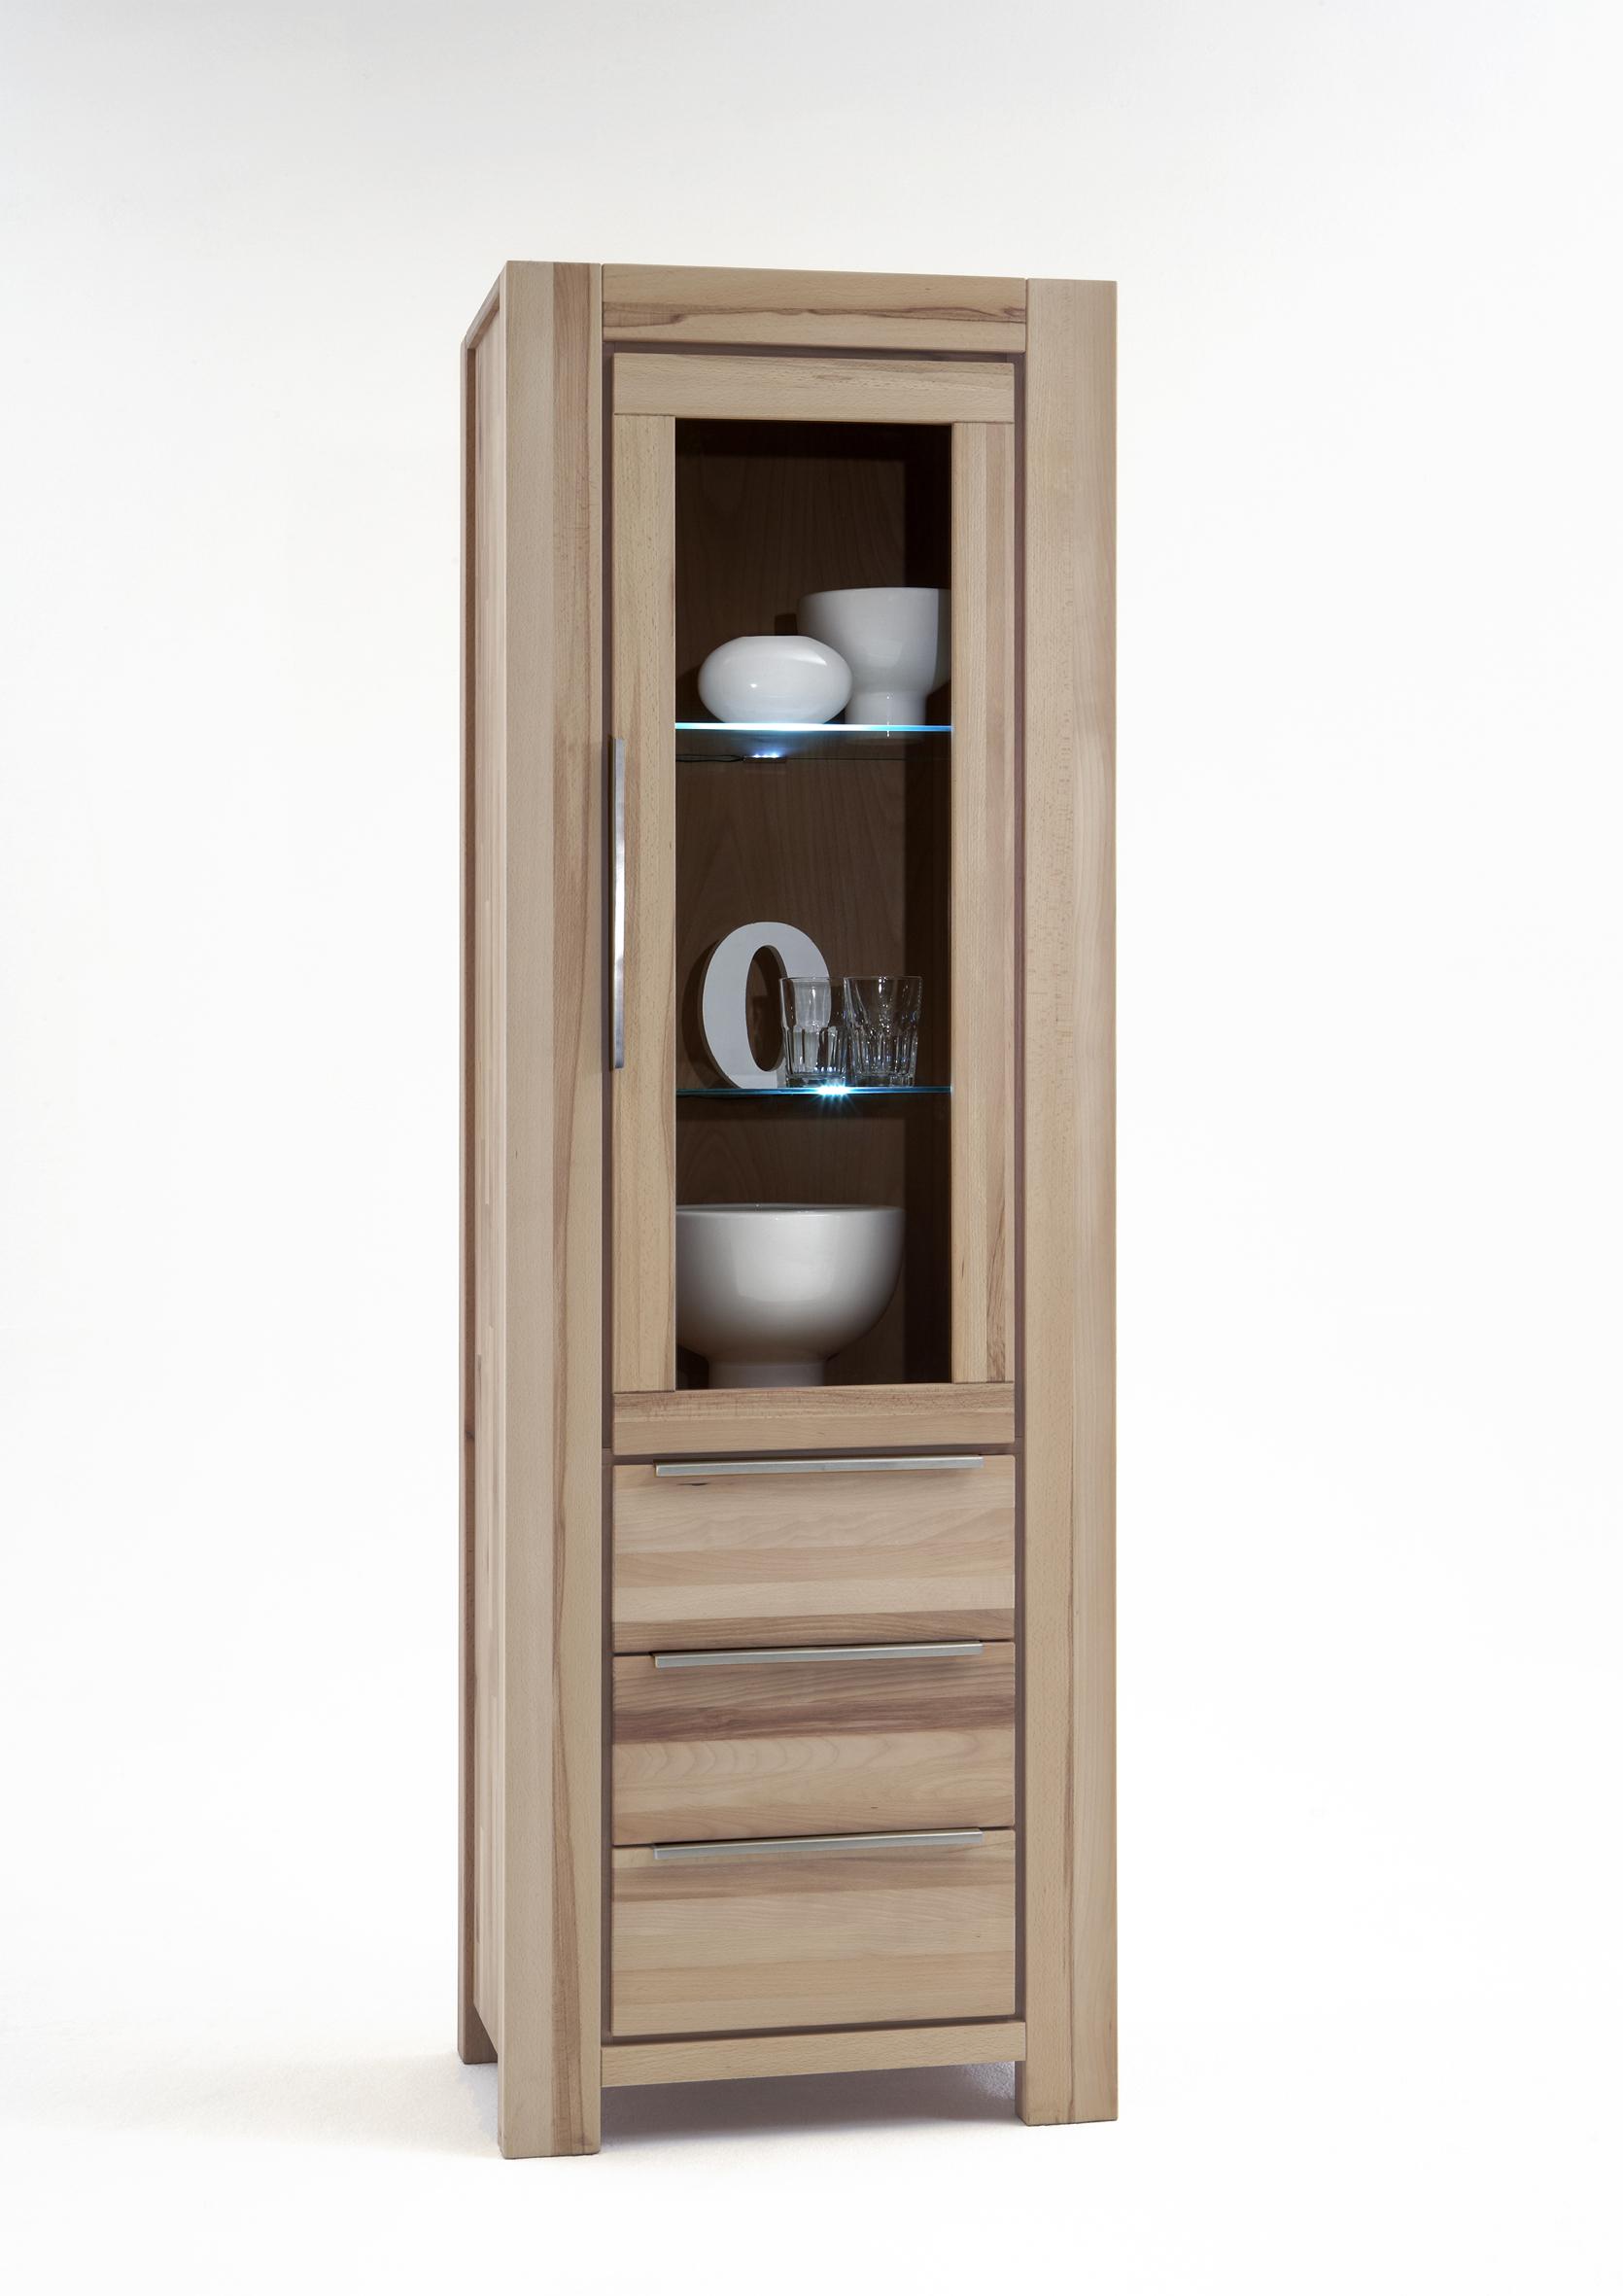 vitrine wildeiche sonoma s gerauh massivholz 2661 elfo. Black Bedroom Furniture Sets. Home Design Ideas